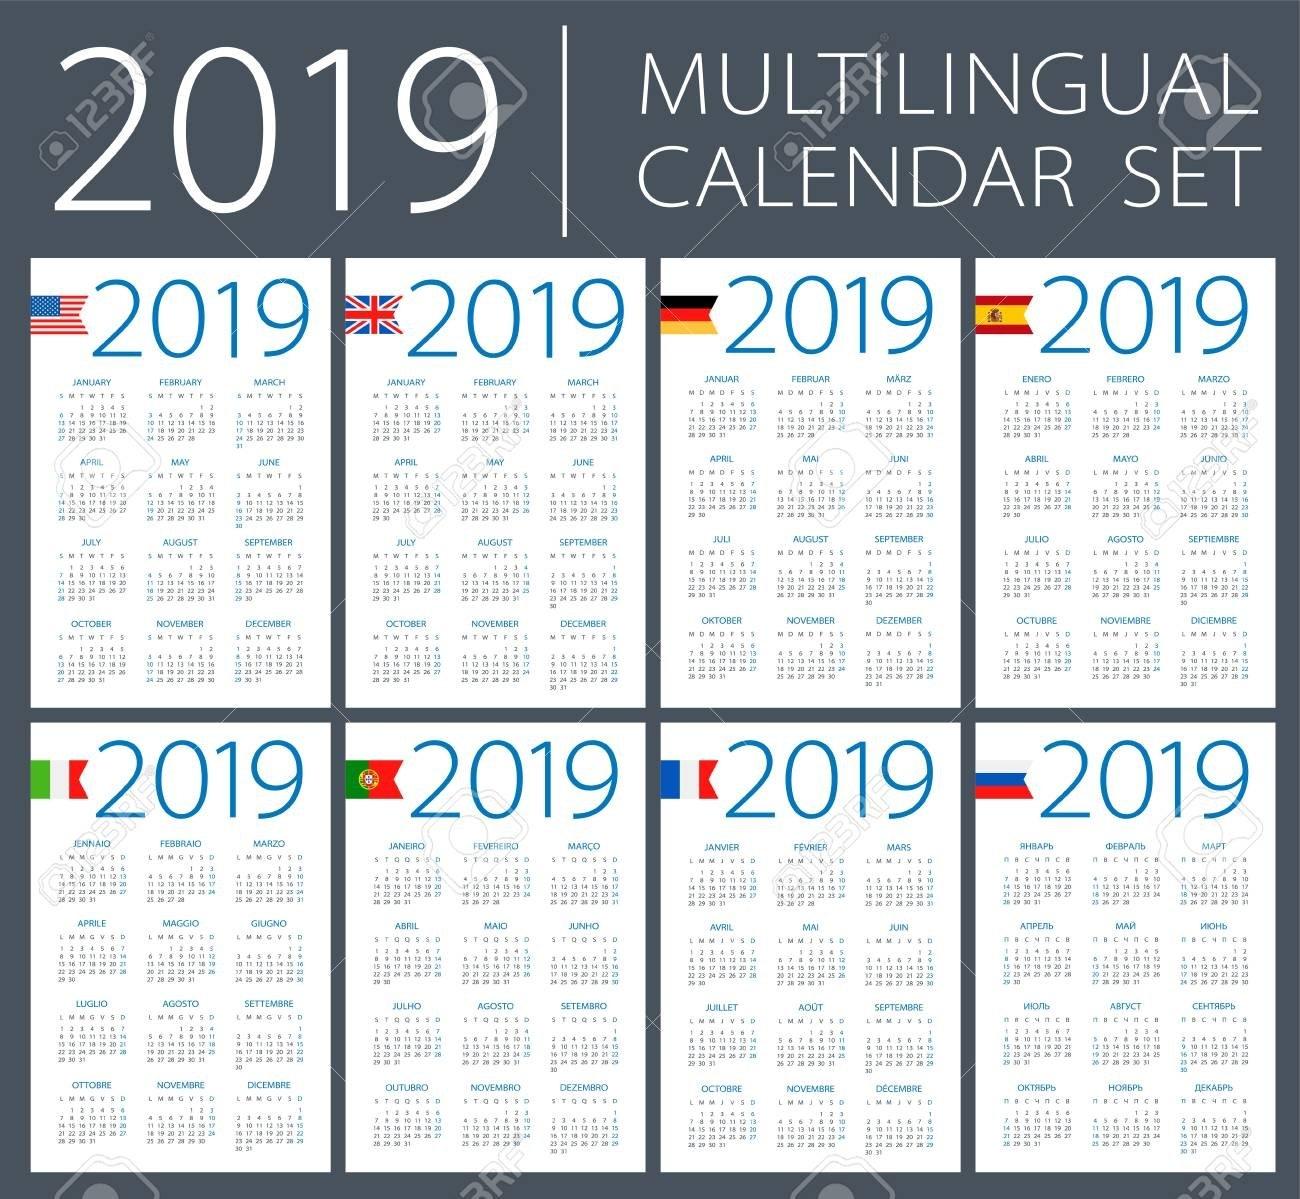 Calendar 2019 Set - English, American, Spanish, German, Portuguese Calendar 2019 America